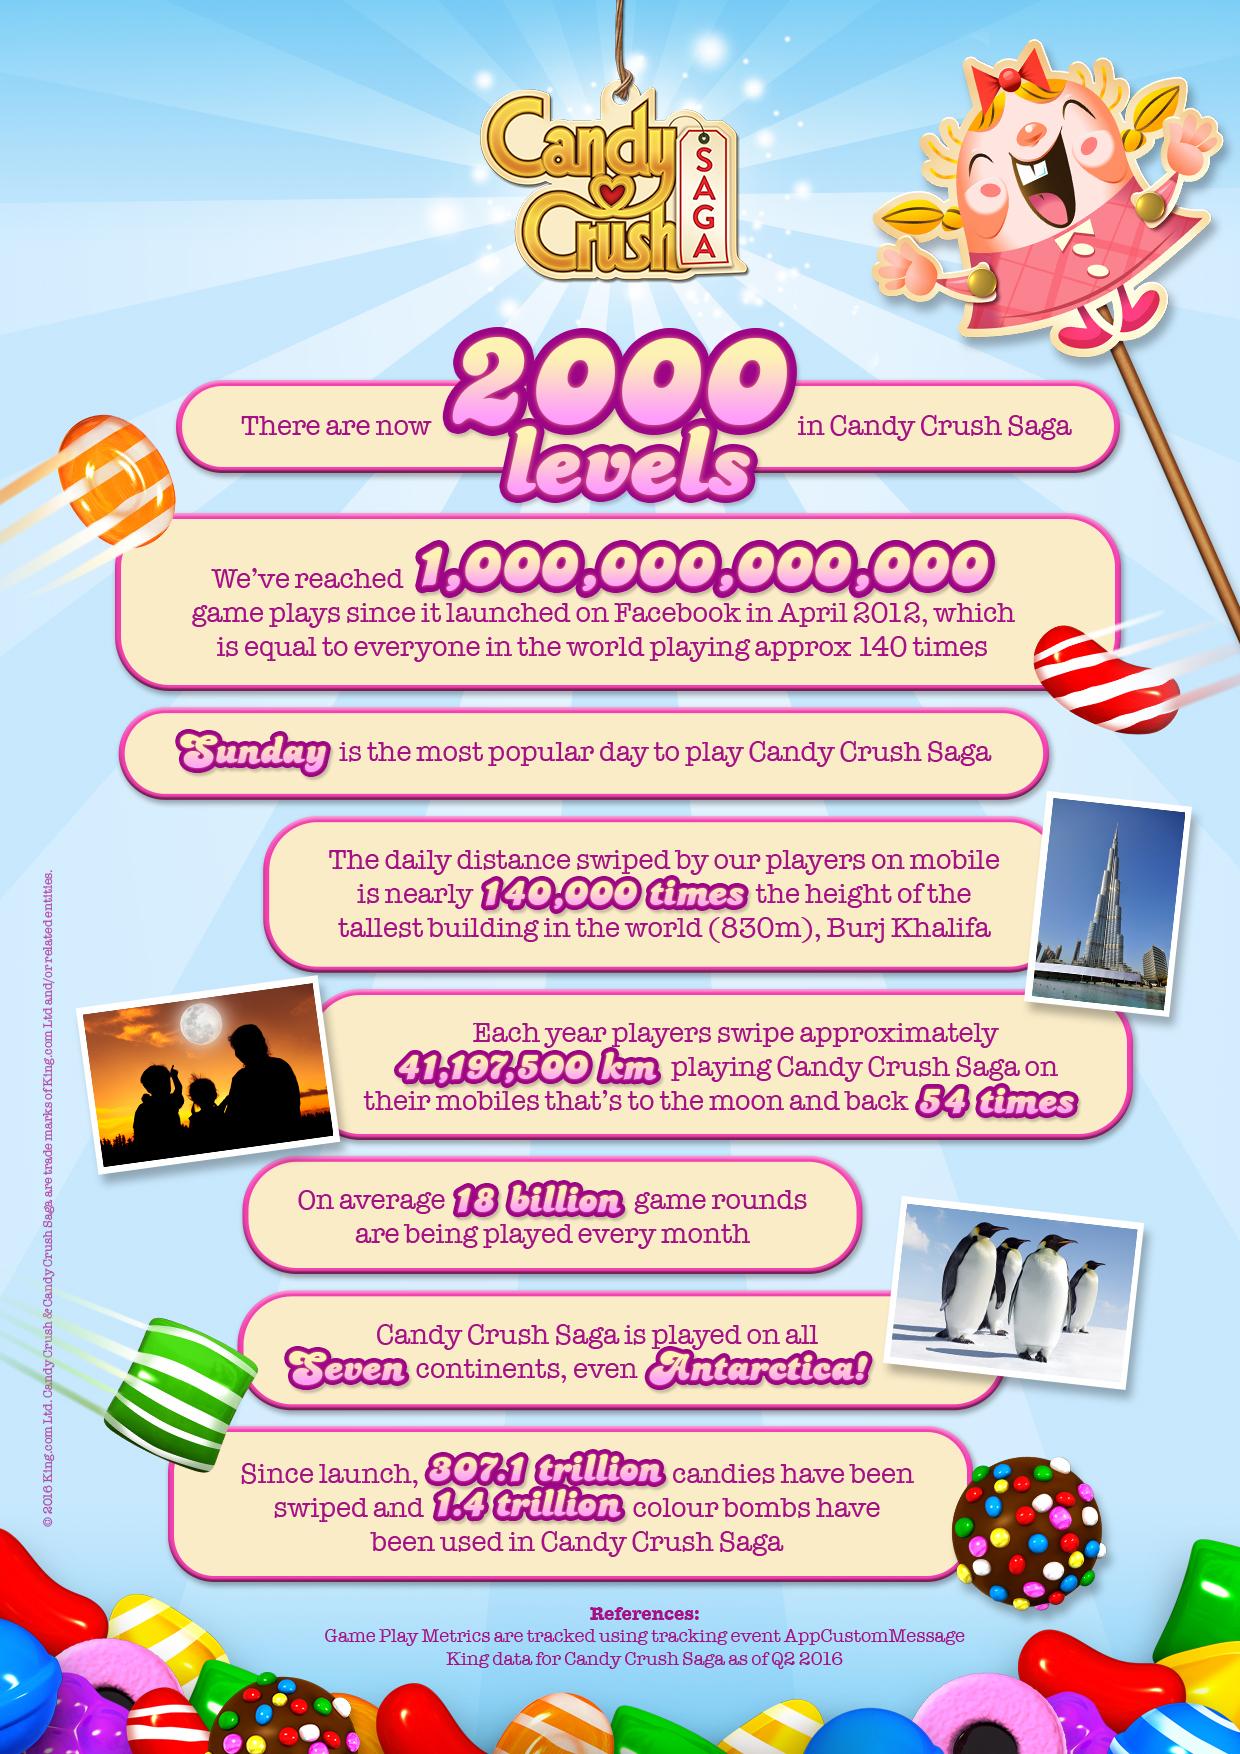 Candy Crush Saga 2000th level infographic.